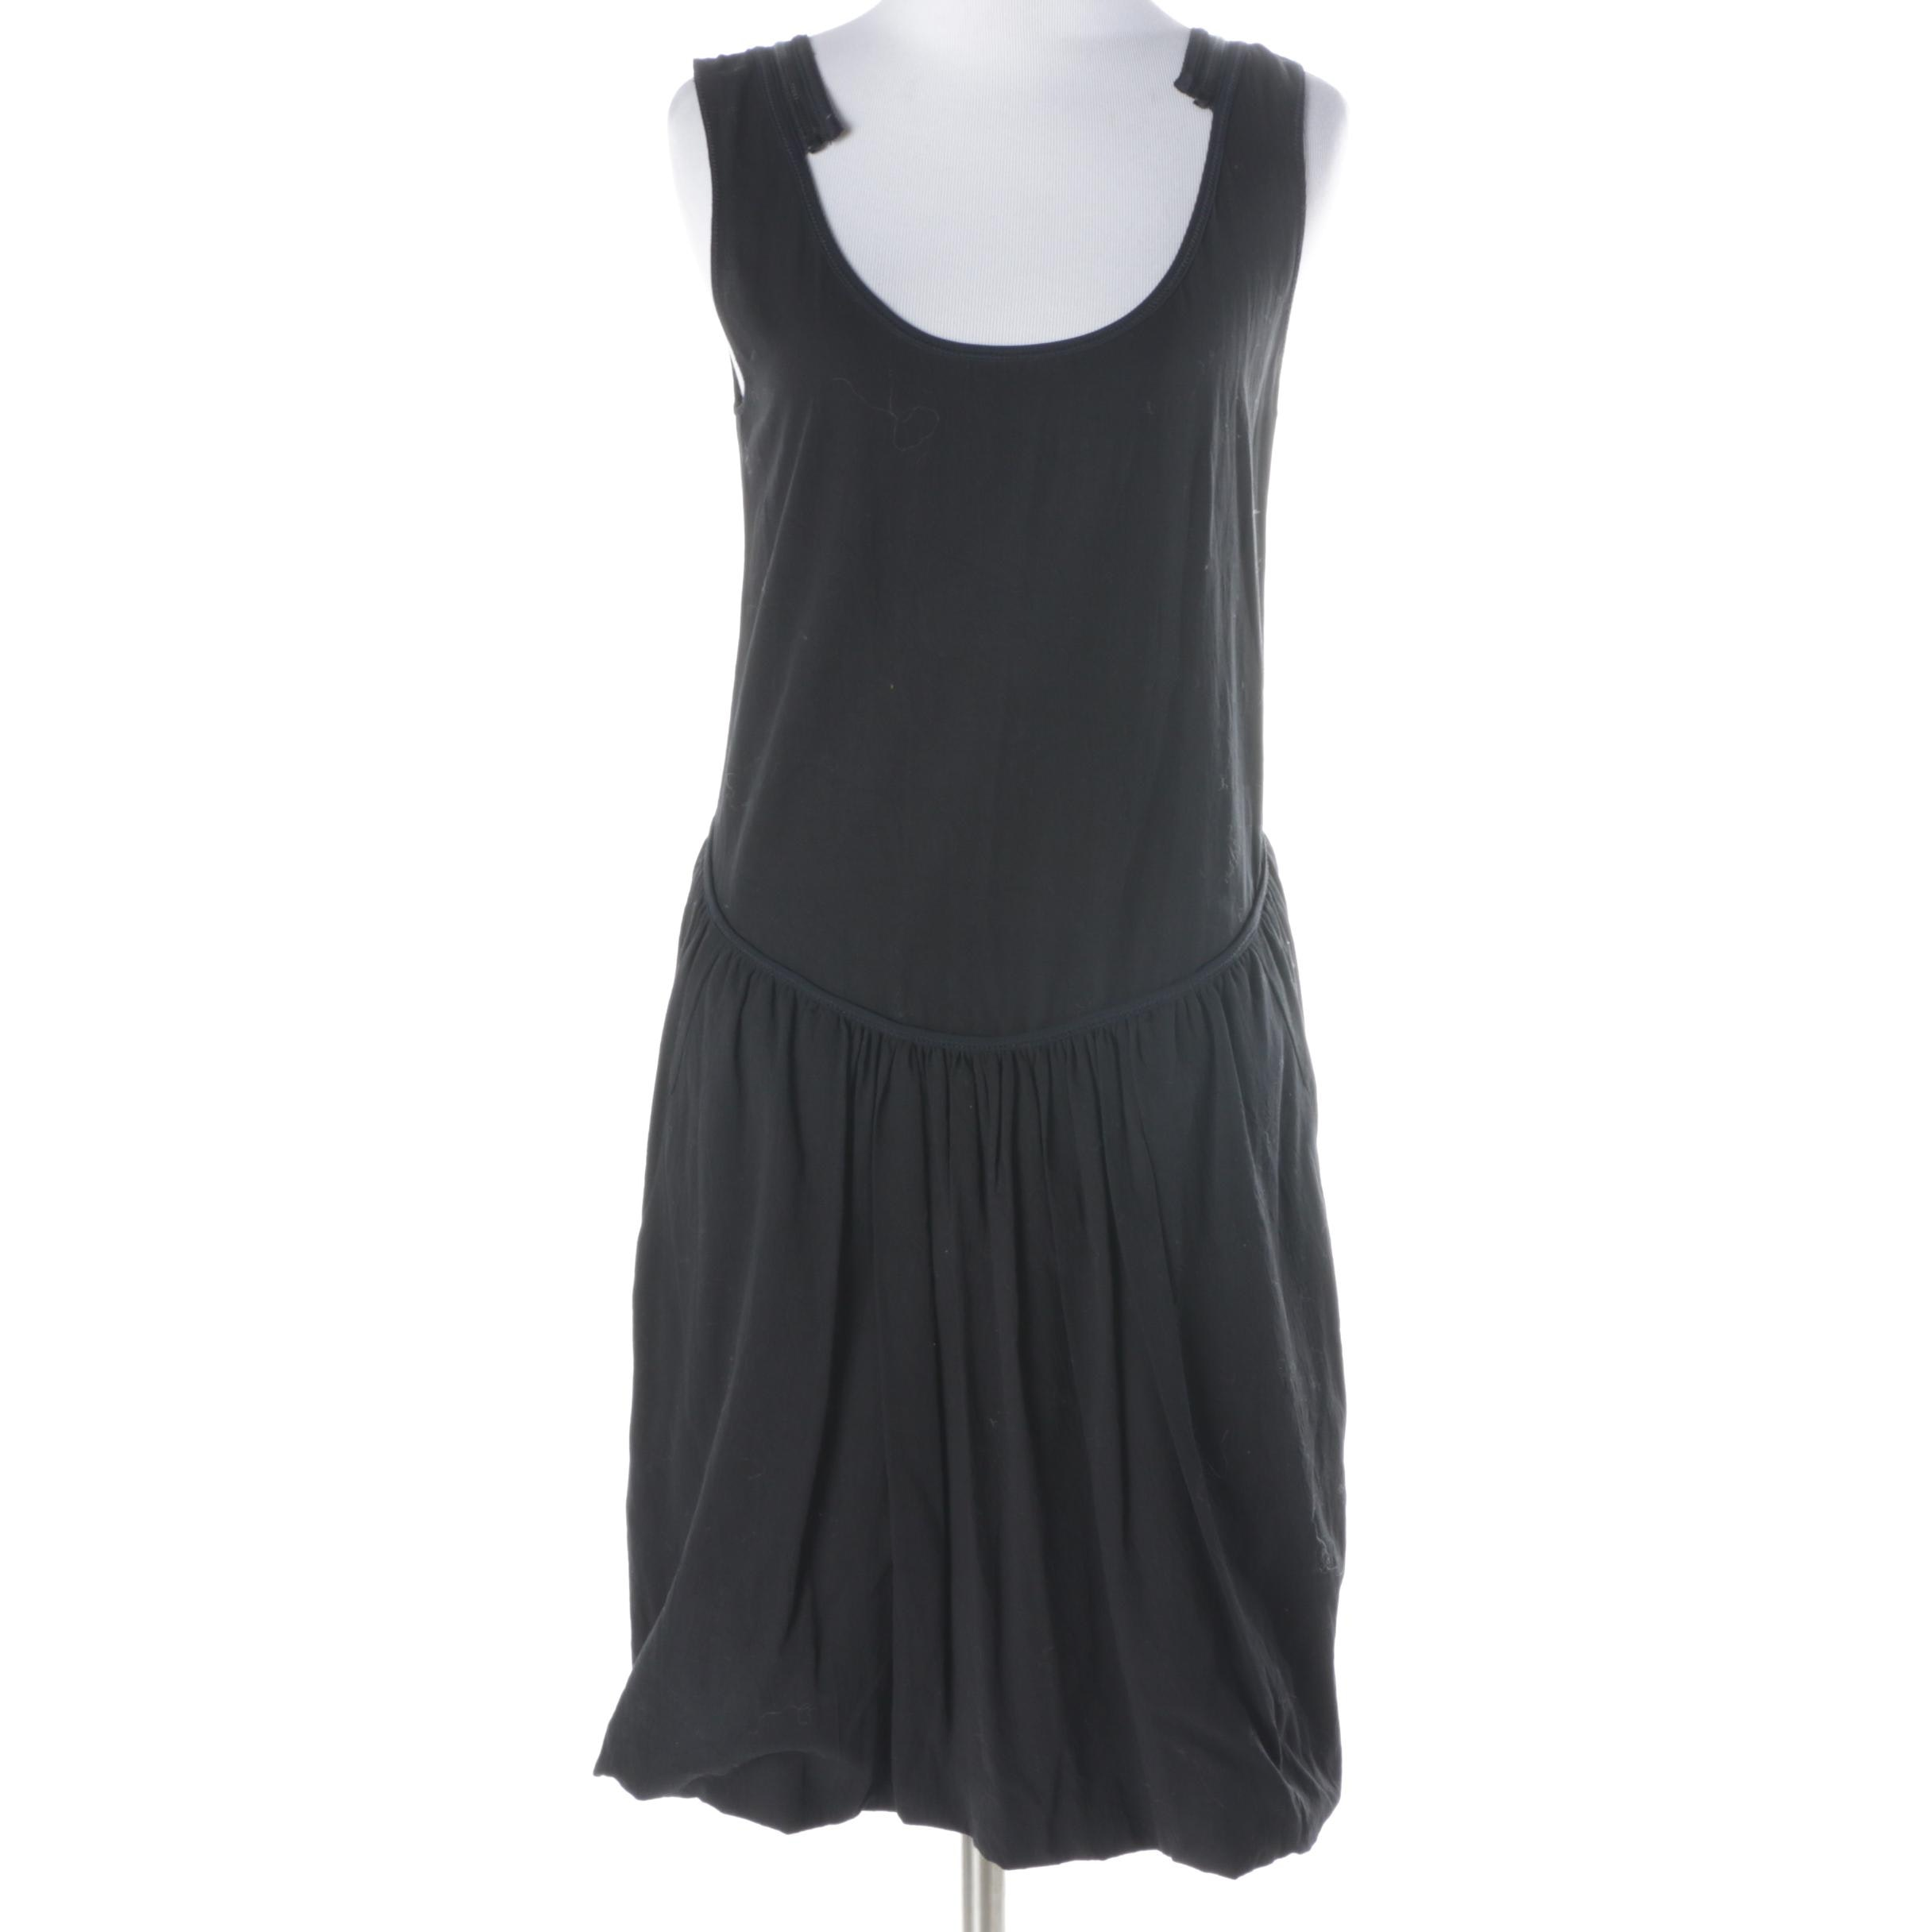 Prada Black Sleeveless Dress